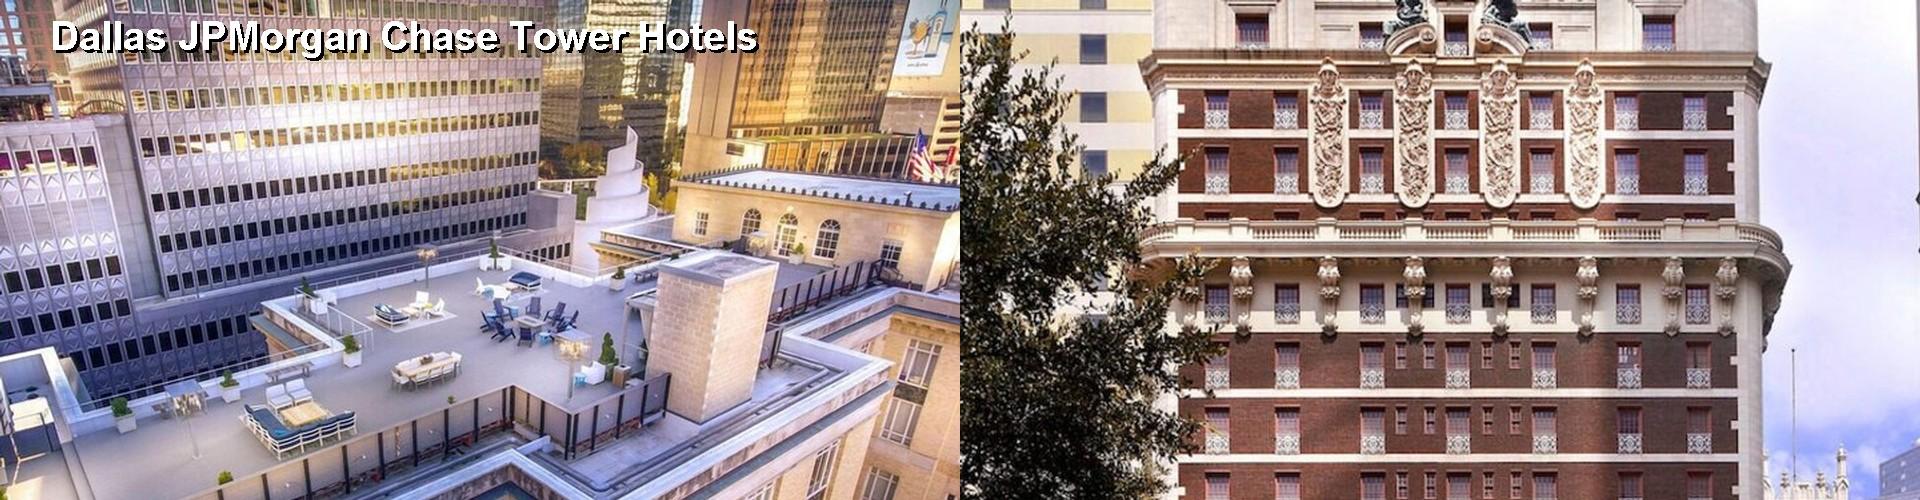 5 Best Hotels Near Dallas Jpmorgan Chase Tower